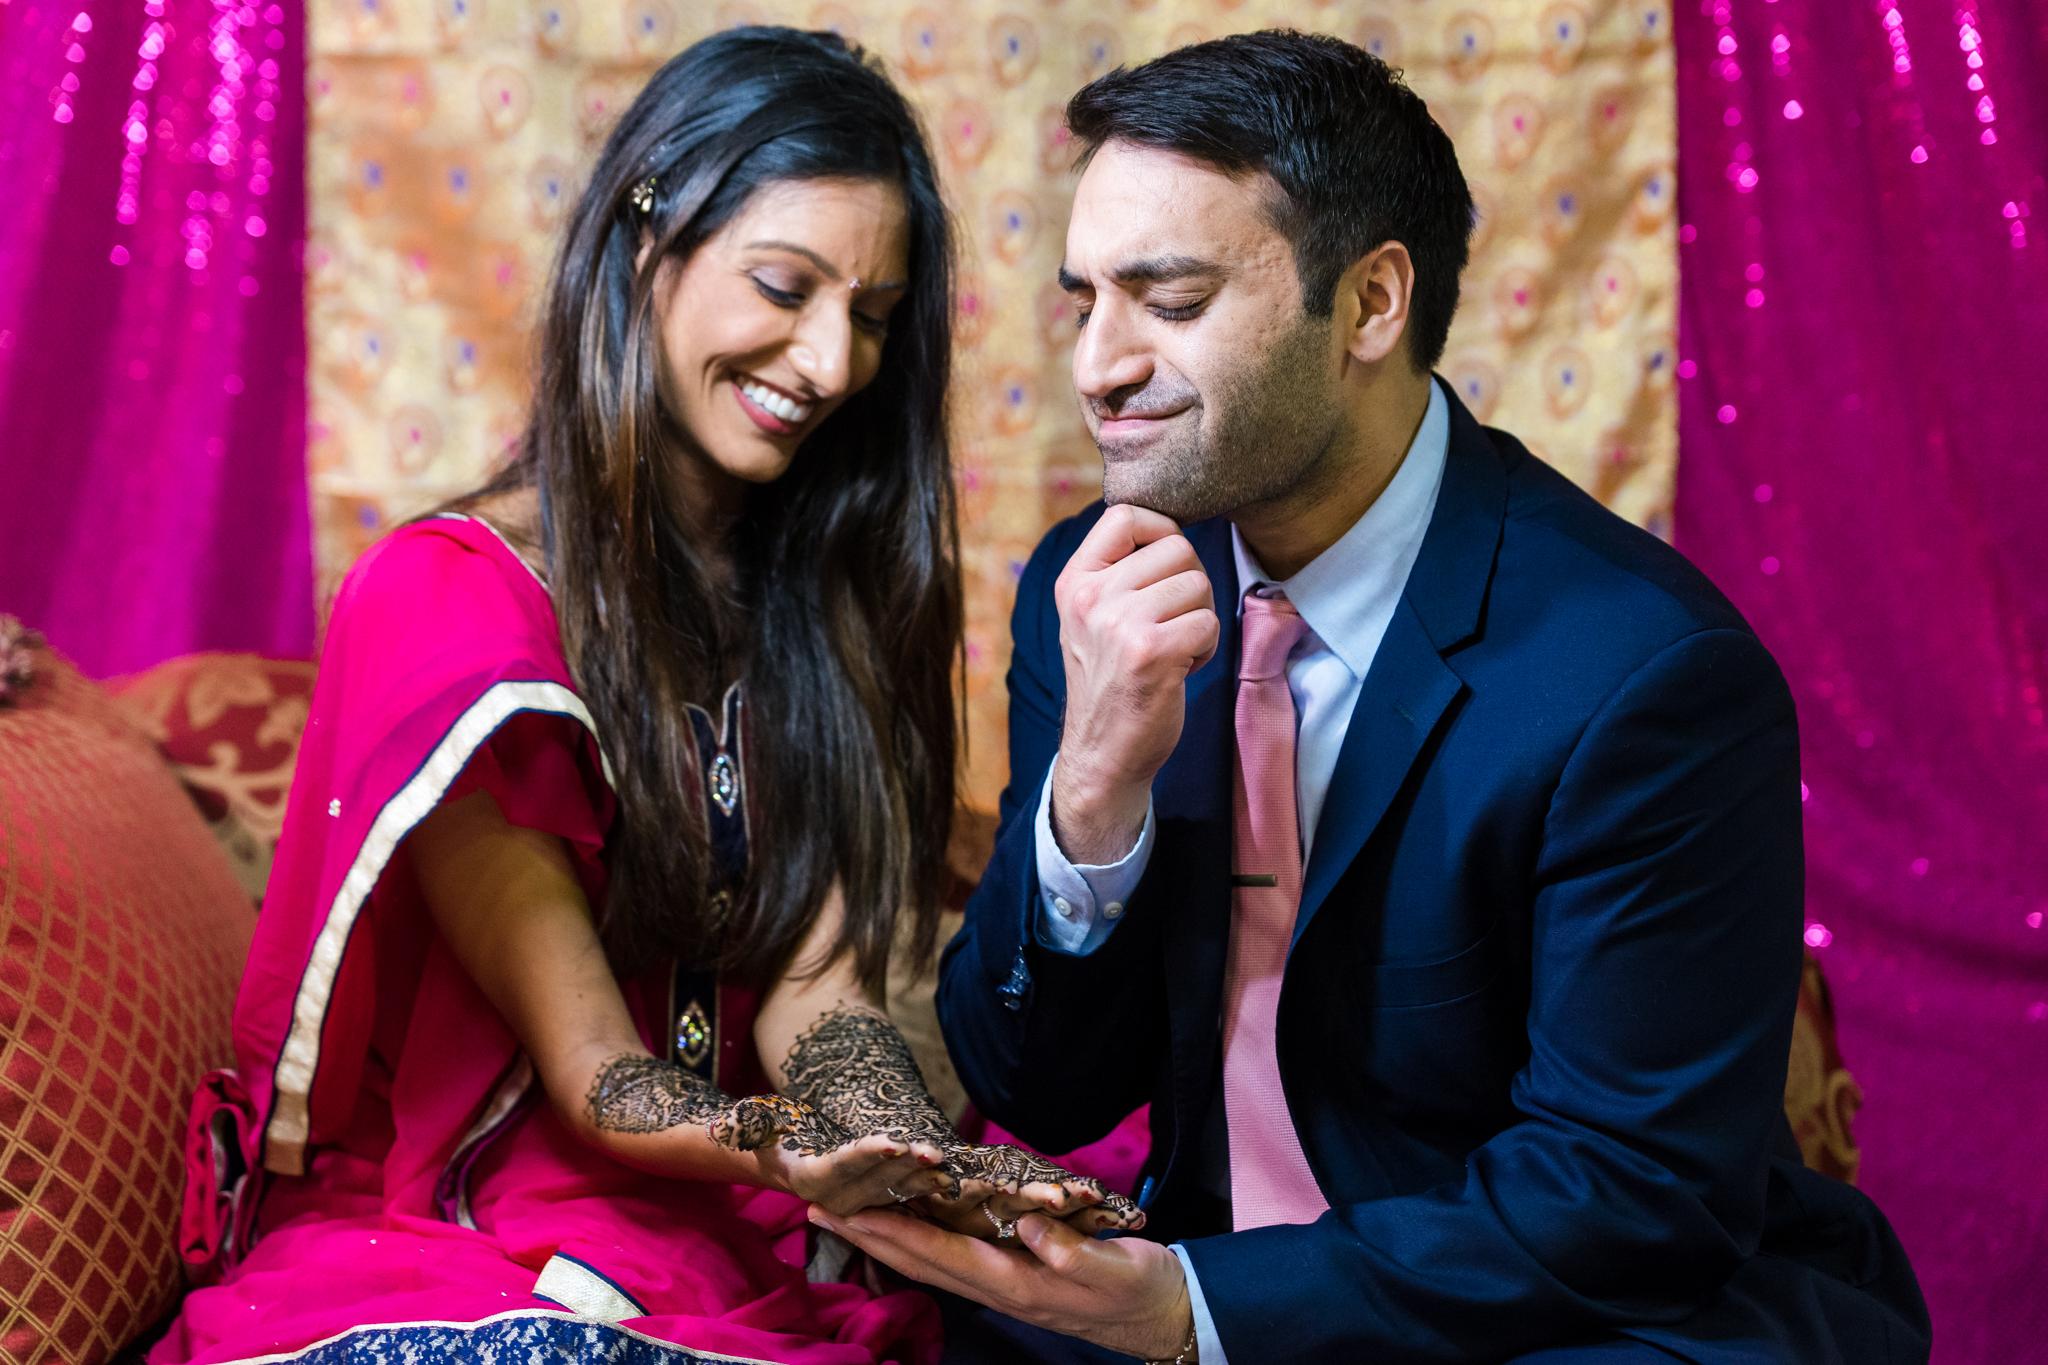 ReeyaAman-Wedding-Photography-www.MnMfoto.comMnMfoto-Krishna-Sajan-119.jpg